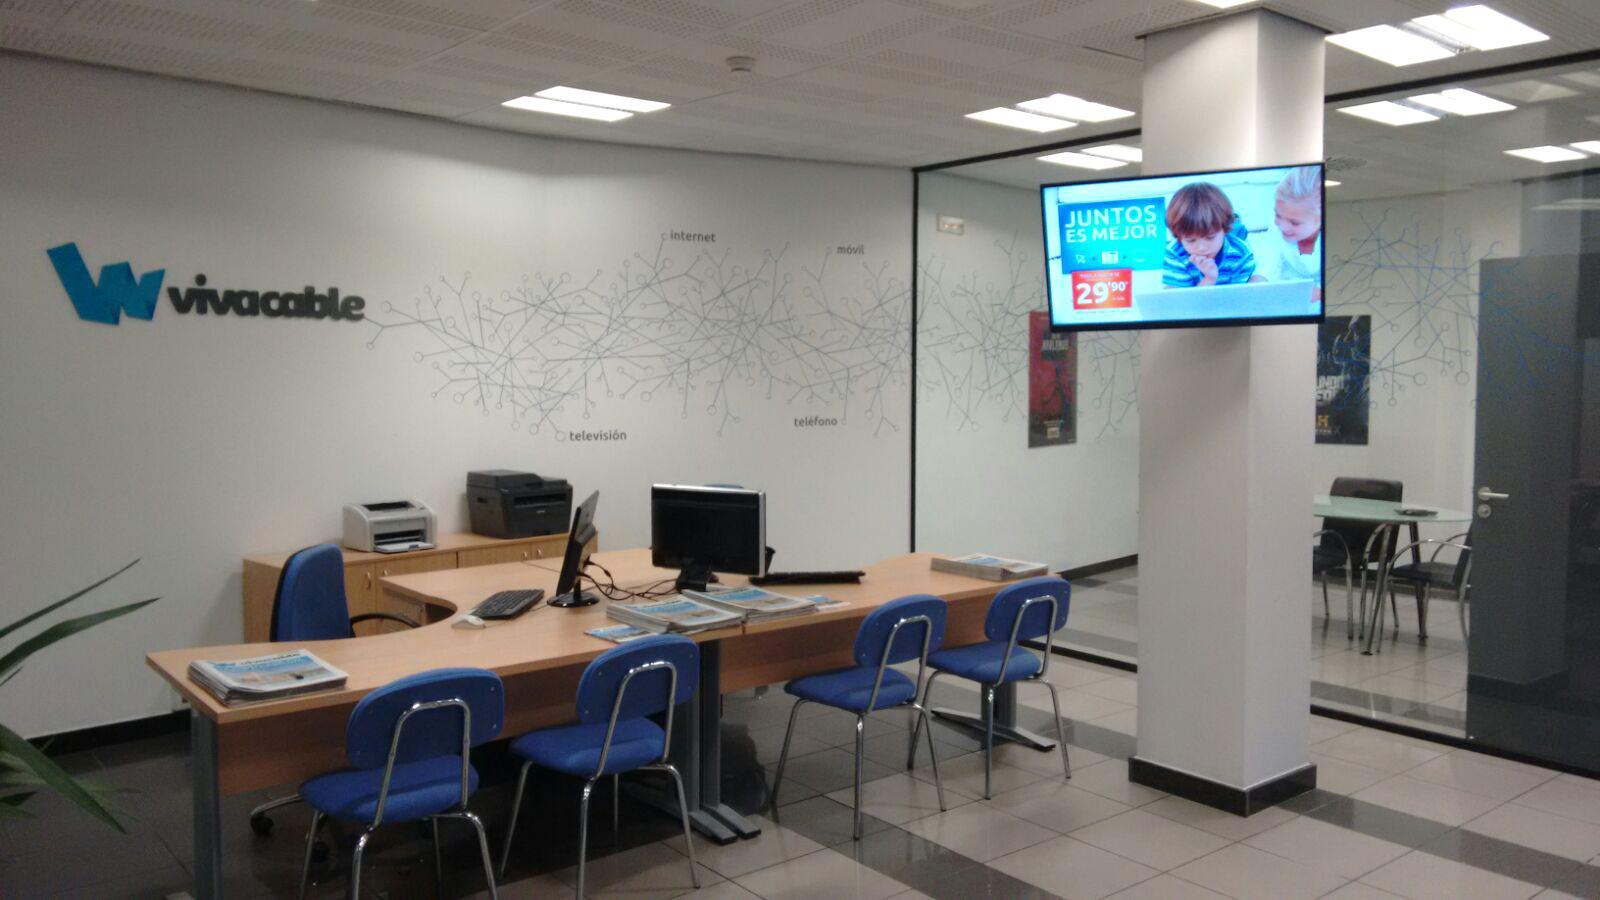 Vivacable abre este lunes su oficina en carmona for Oficina turismo carmona